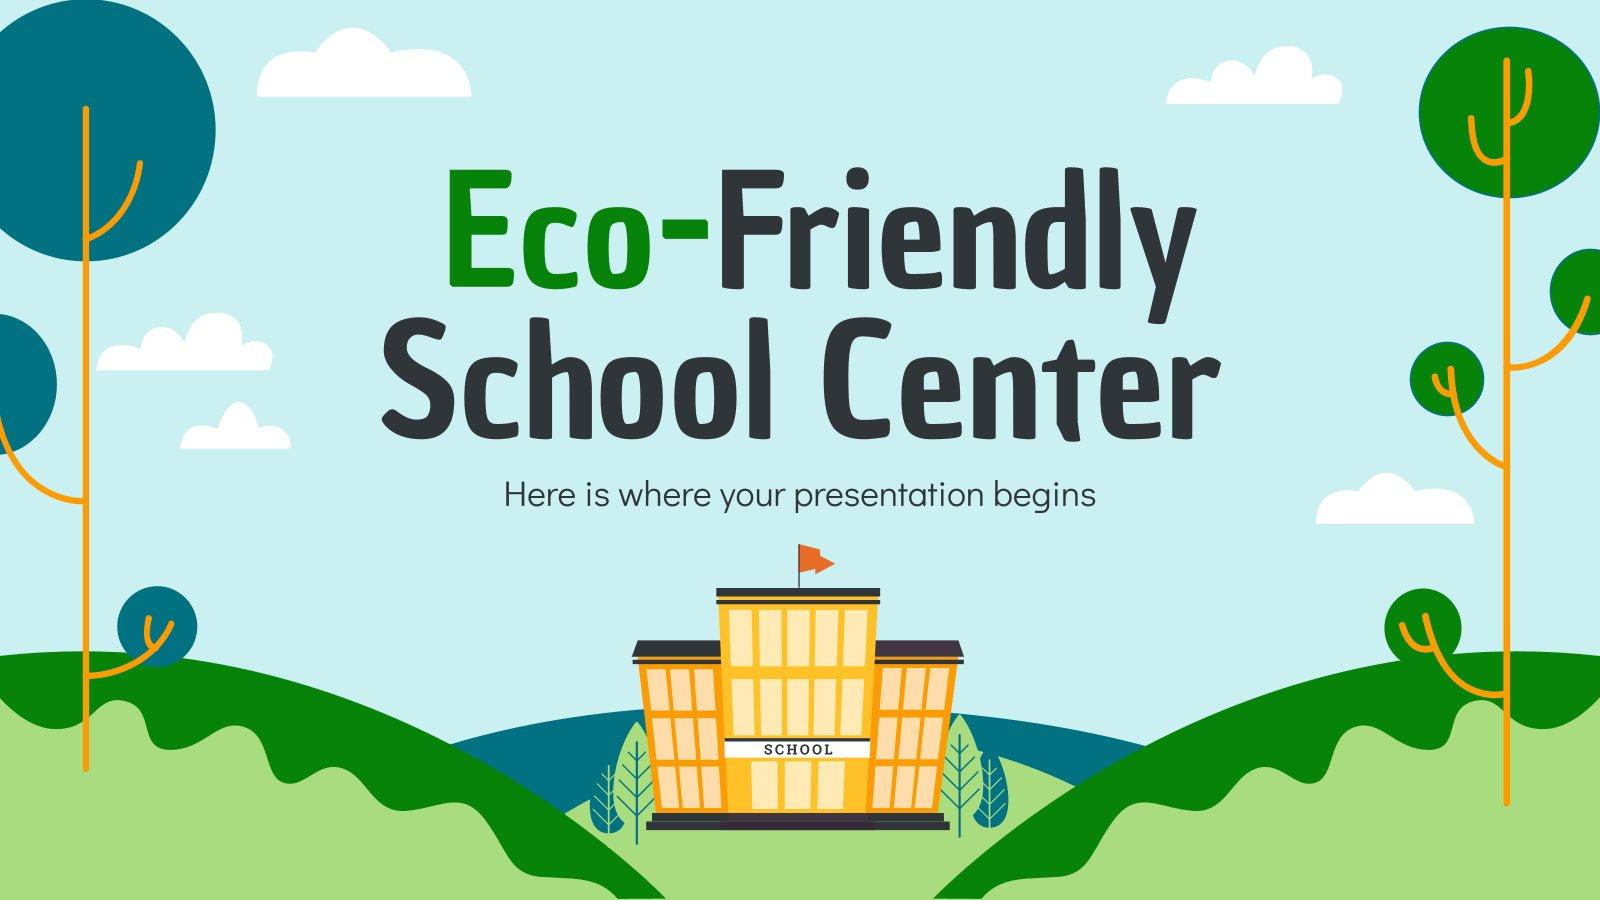 Eco-Friendly School Center presentation template